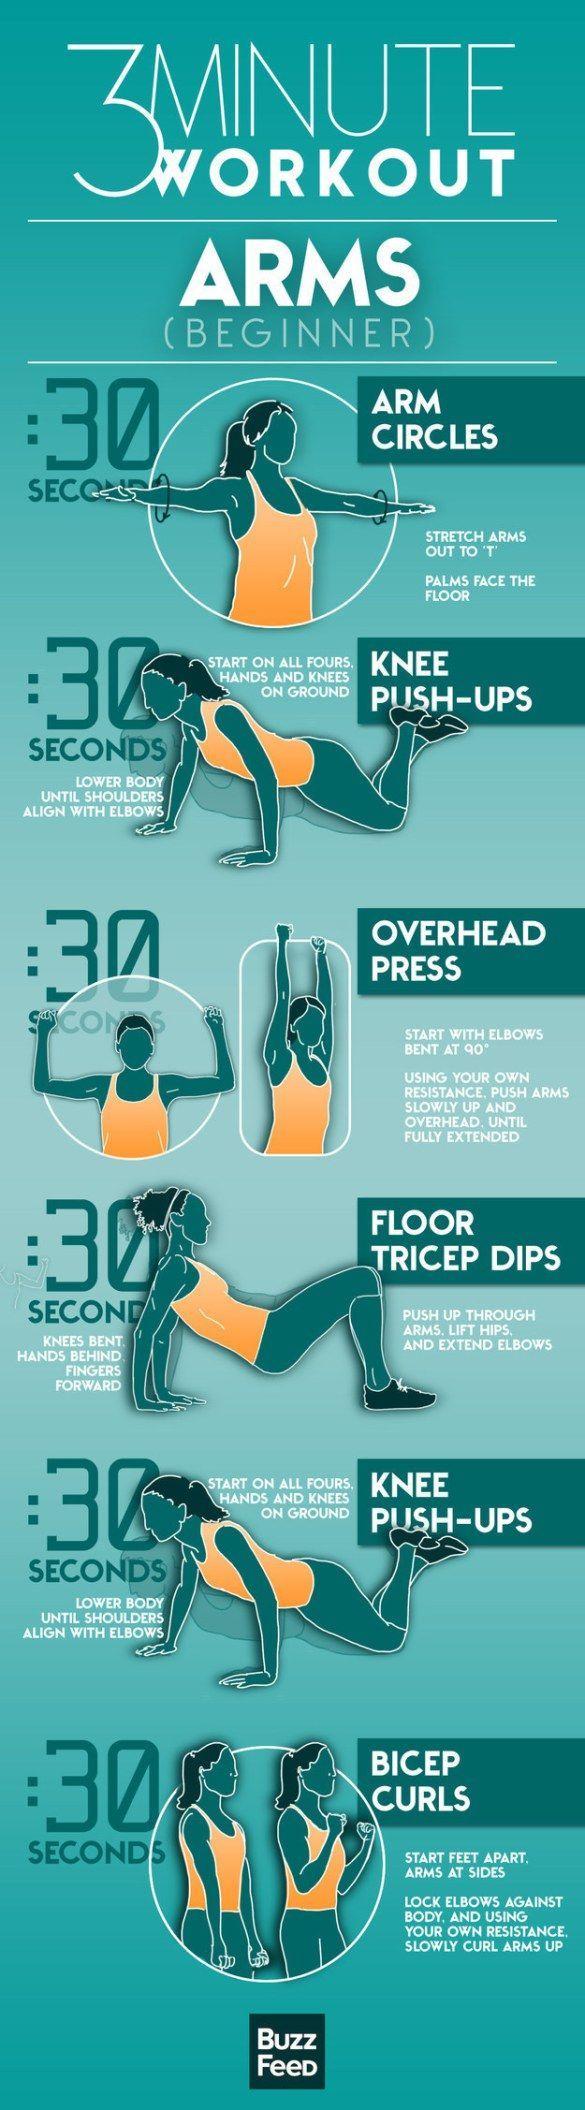 8 3 minute workout http://fancytemplestore.com